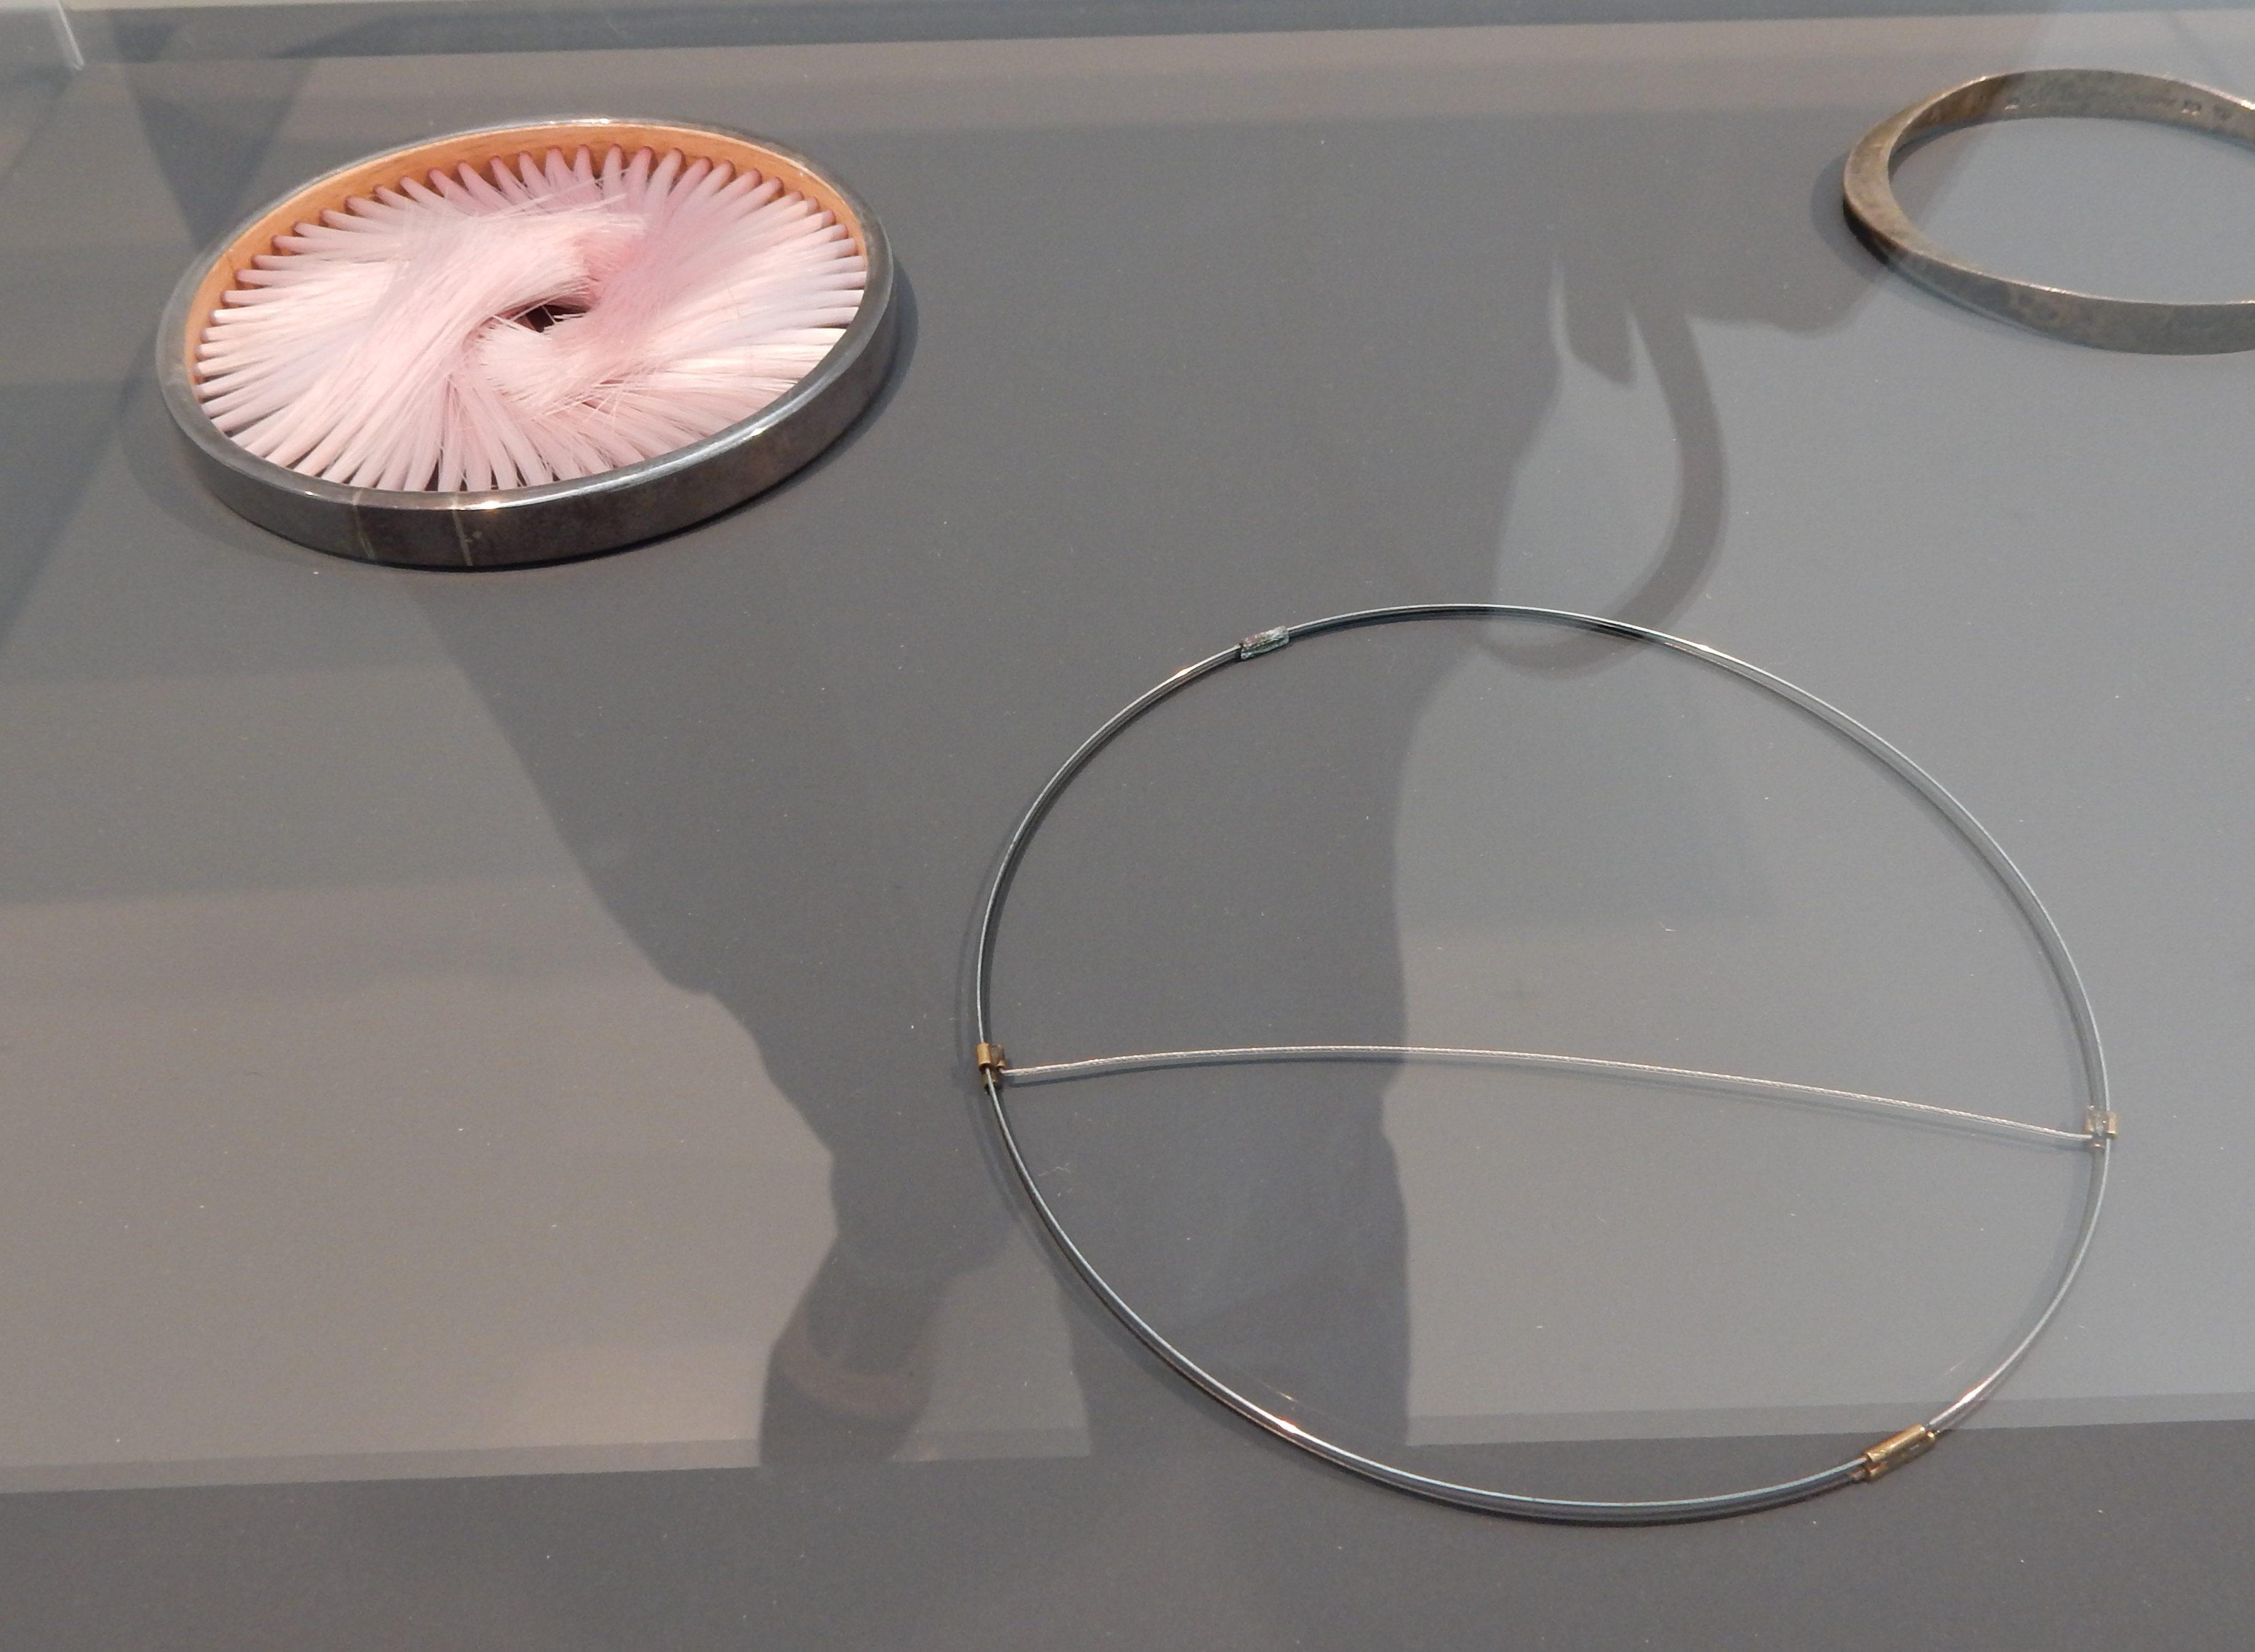 Caroline Broadhead, Beni Bronstein, armbanden, 1978, 1982. Collectie Benno Premsela, metaal, kunststof, vitrine, tentoonstelling